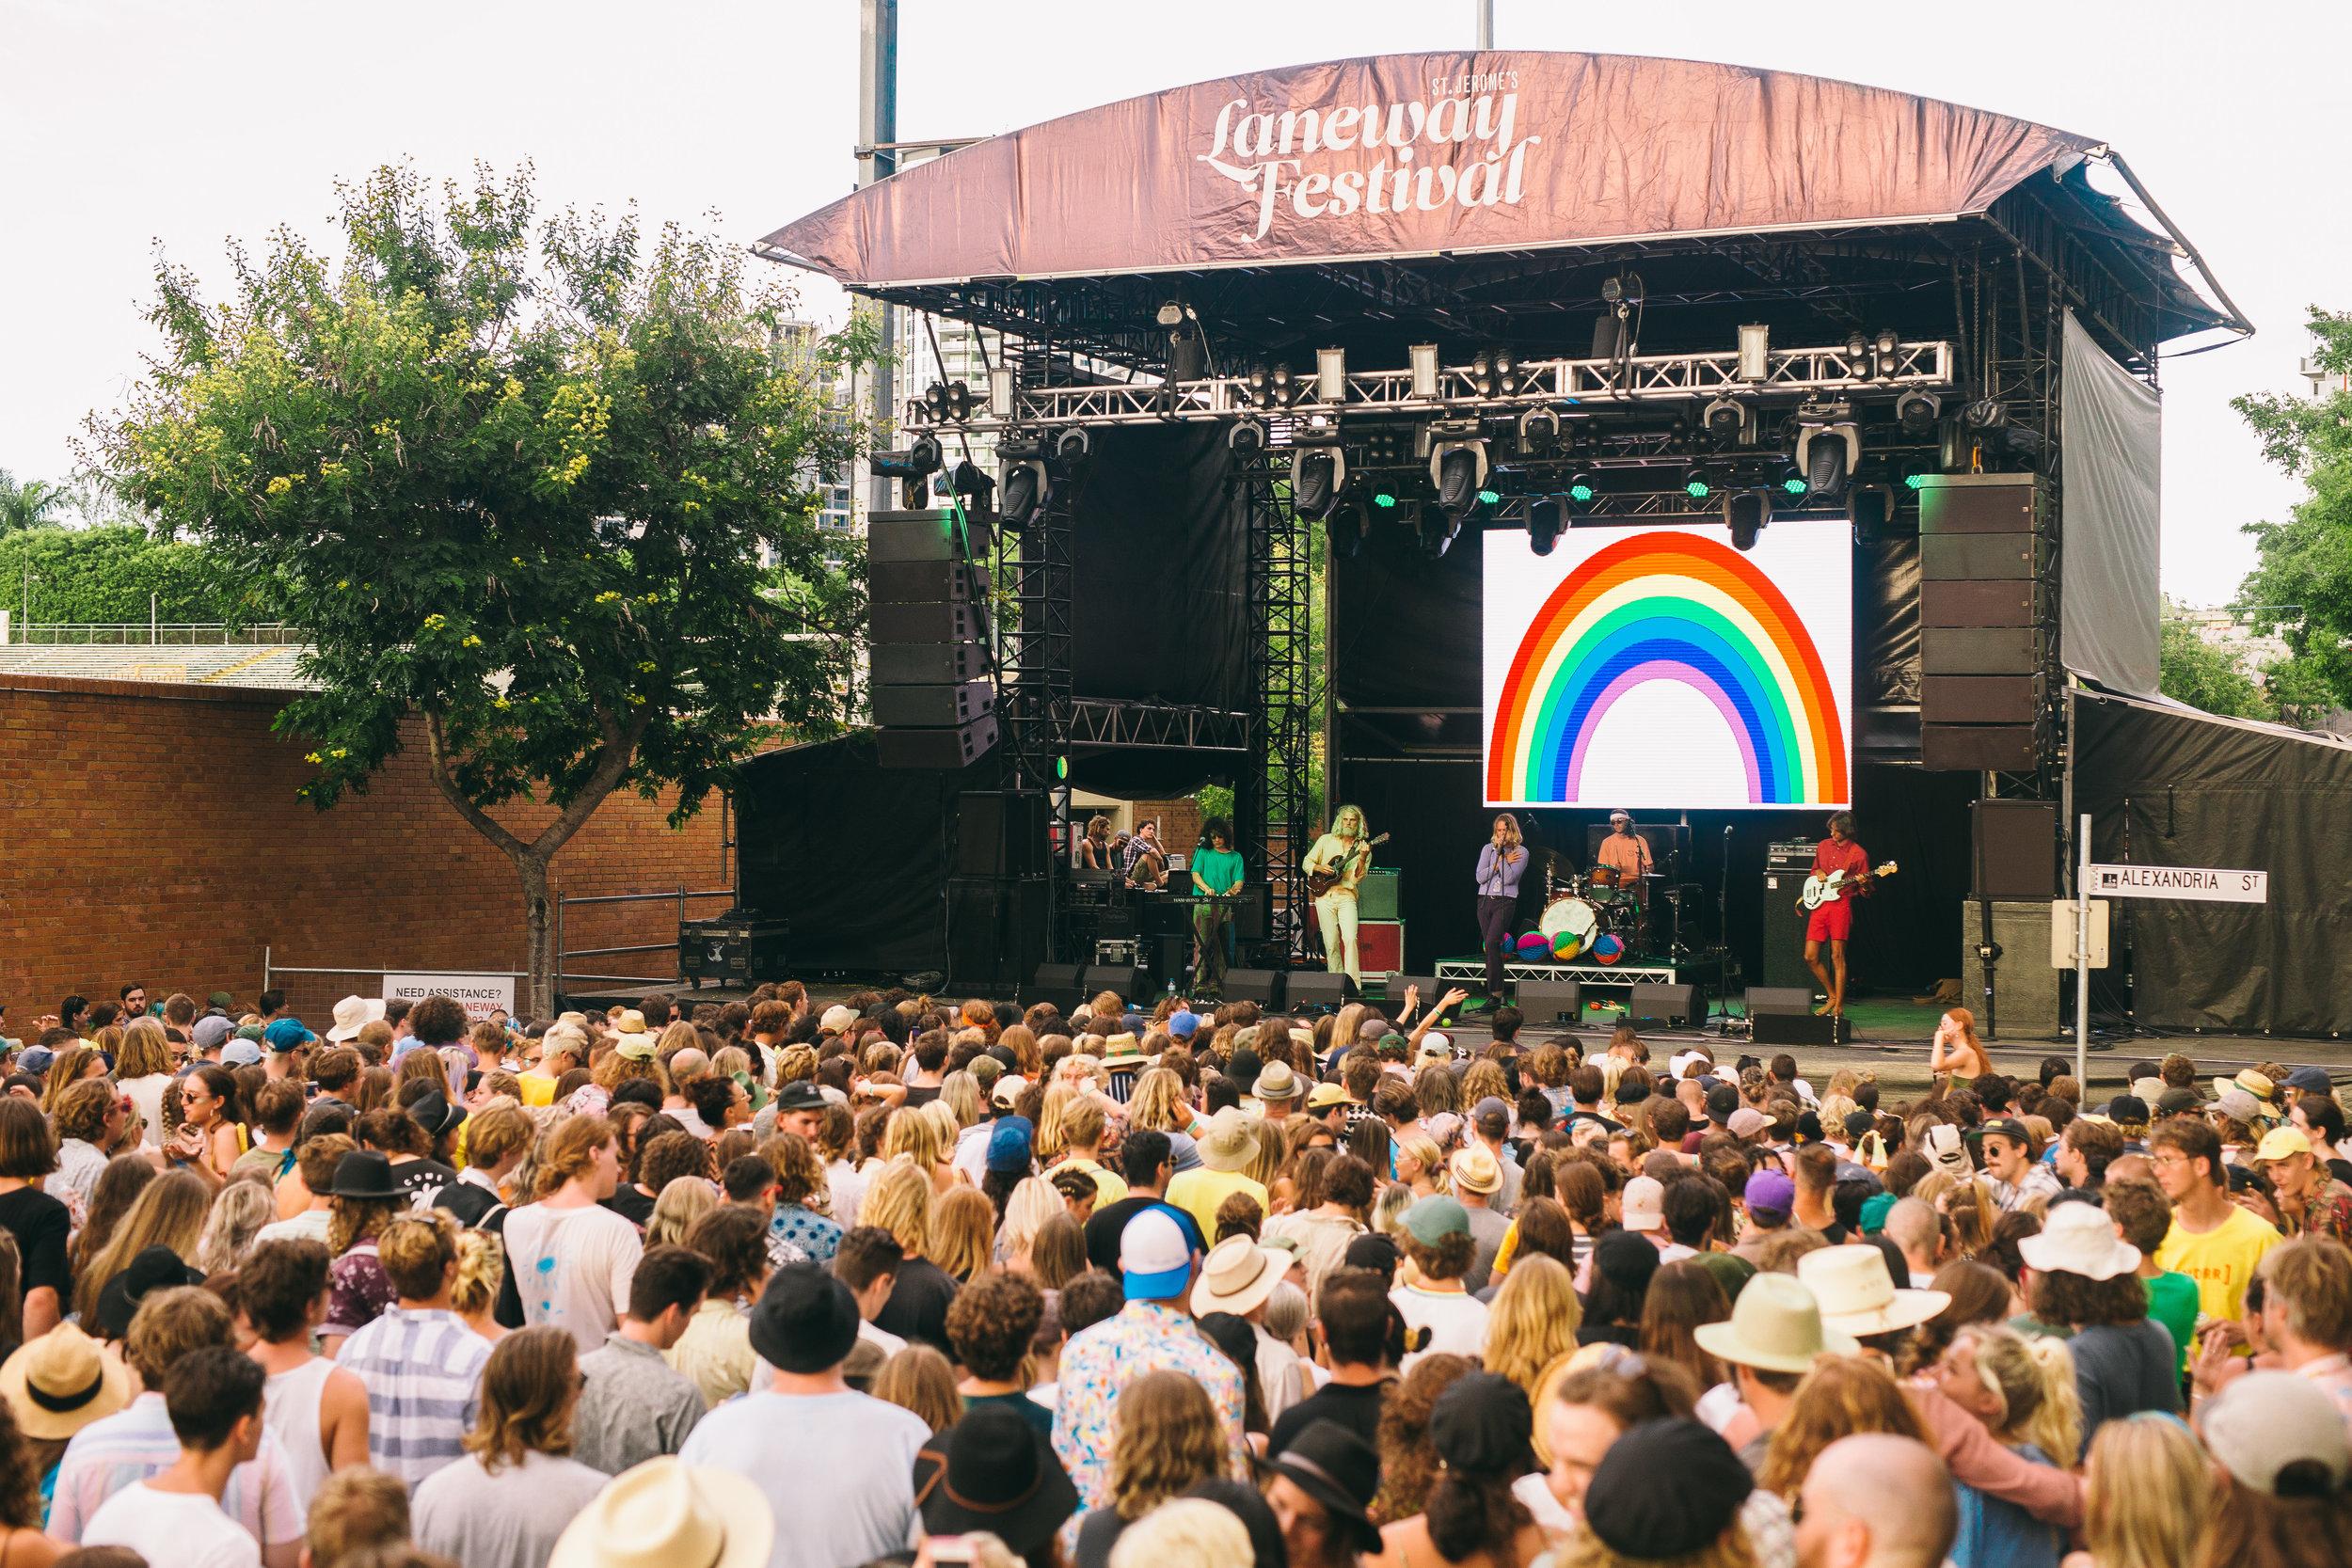 The Babe Rainbow_Laneway-Festival-Brisbane-2018_Credit-Bianca-Holderness-1.jpg